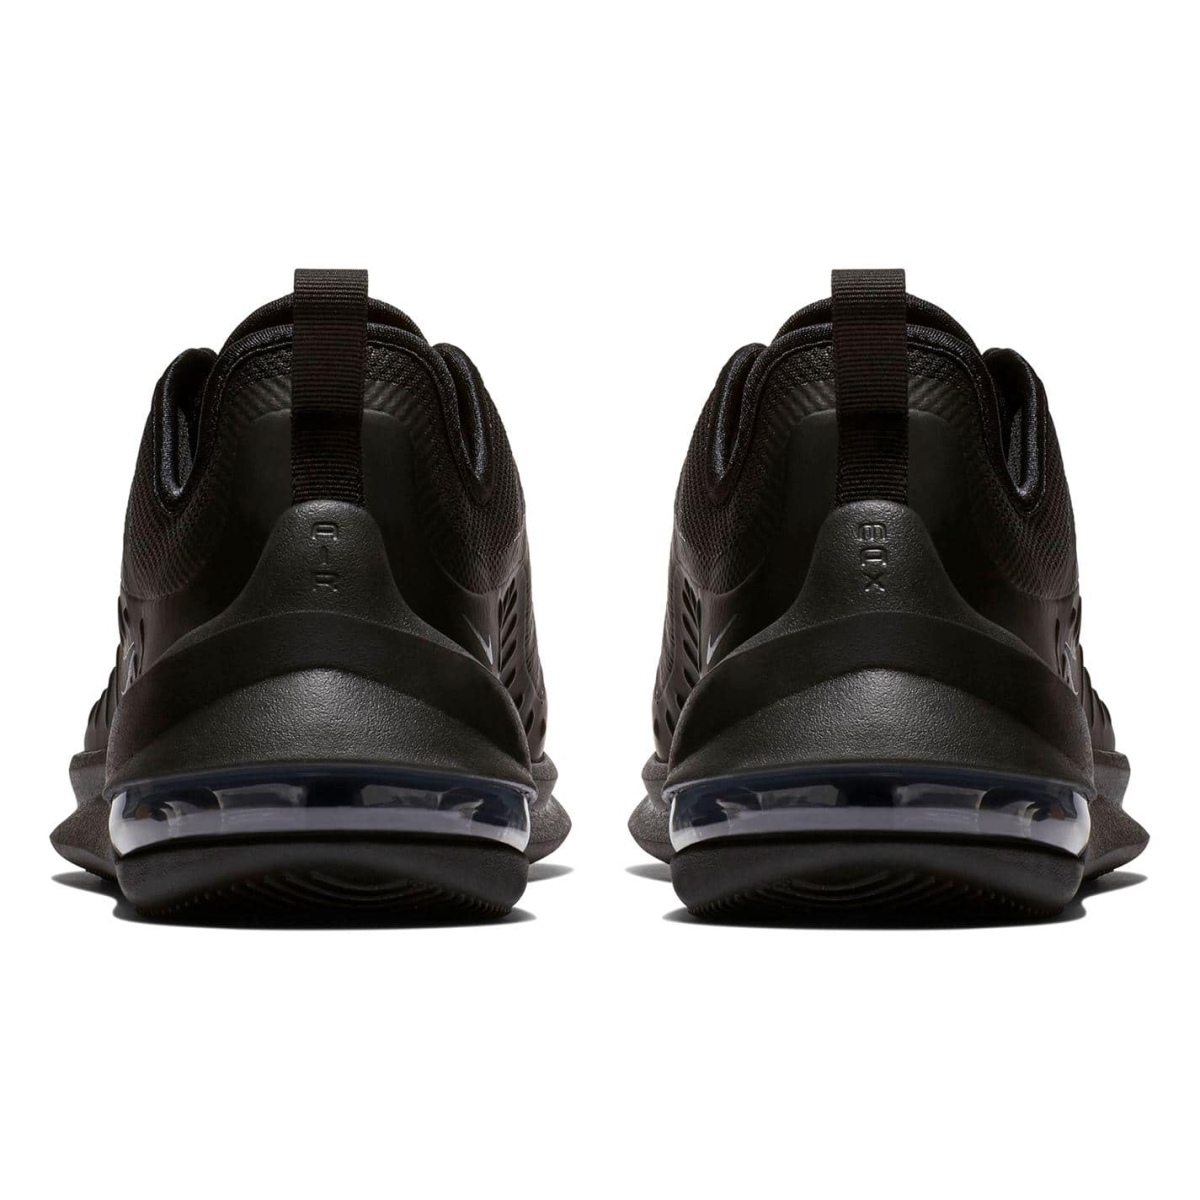 NIKE-Air-Max-Axis-Scarpe-da-ginnastica-Scarpe-da-Corsa-Uomo-Sneaker-Scarpe-Sportive-Fitness-1313 miniatura 6